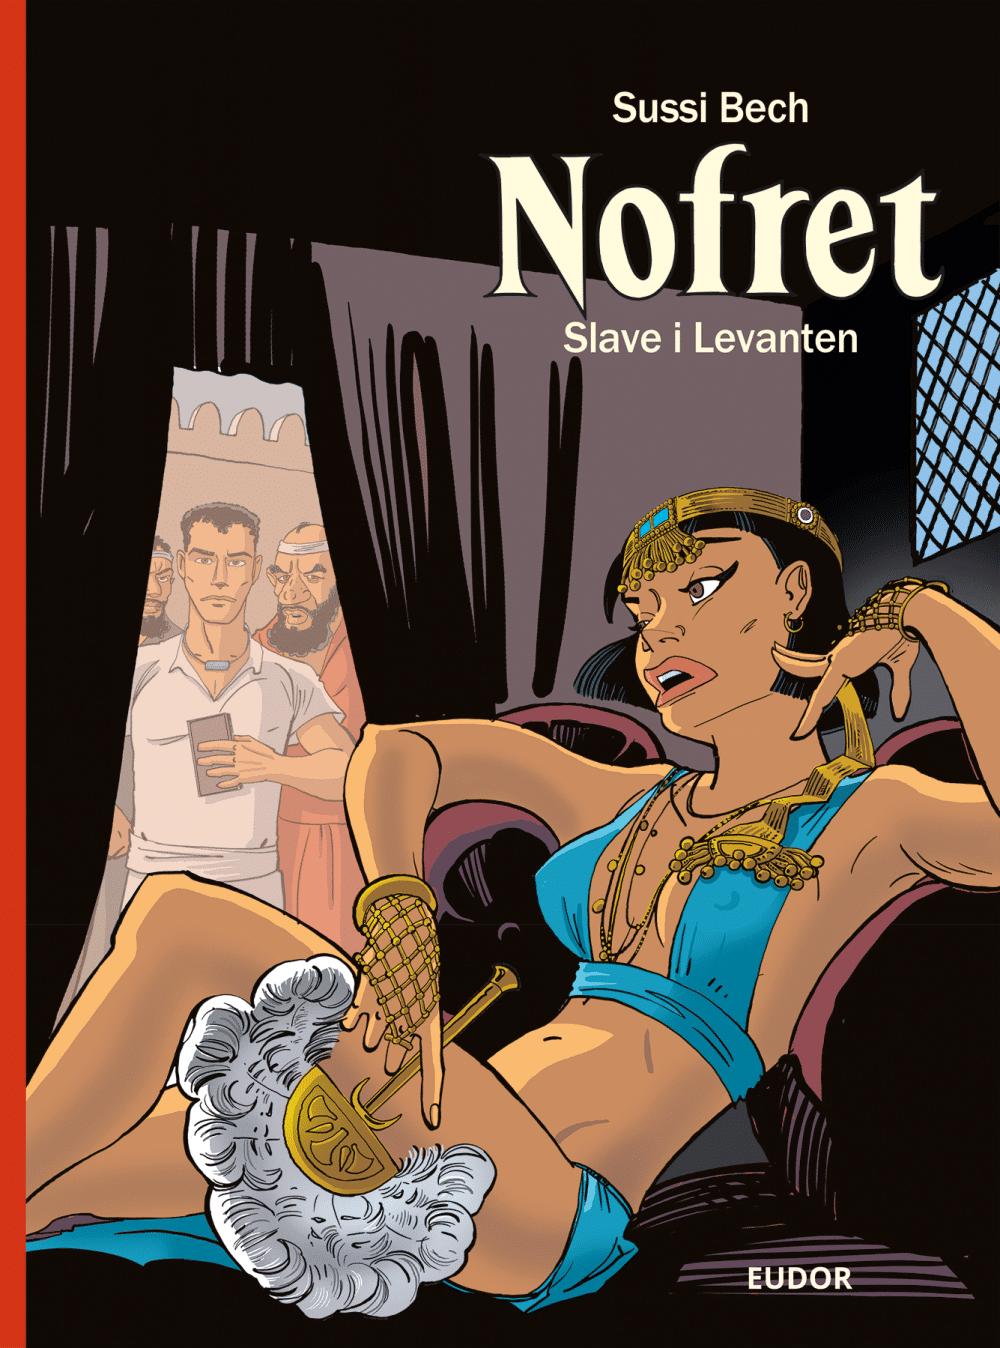 Nofret---Slave-i-Levanten---COVER-SORT